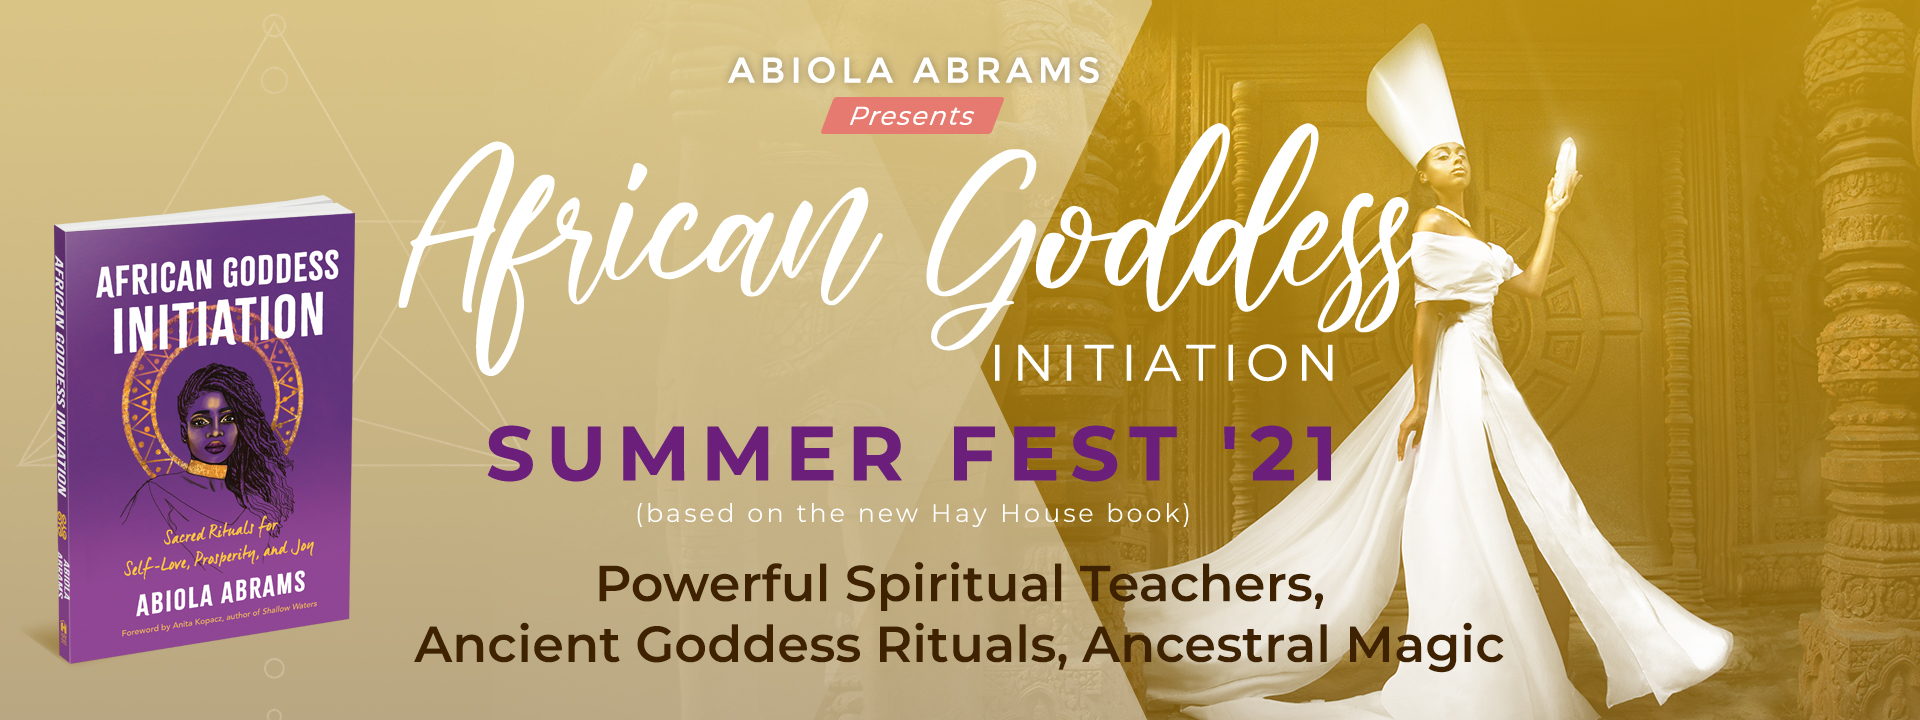 African Goddess Summer Fest 2021